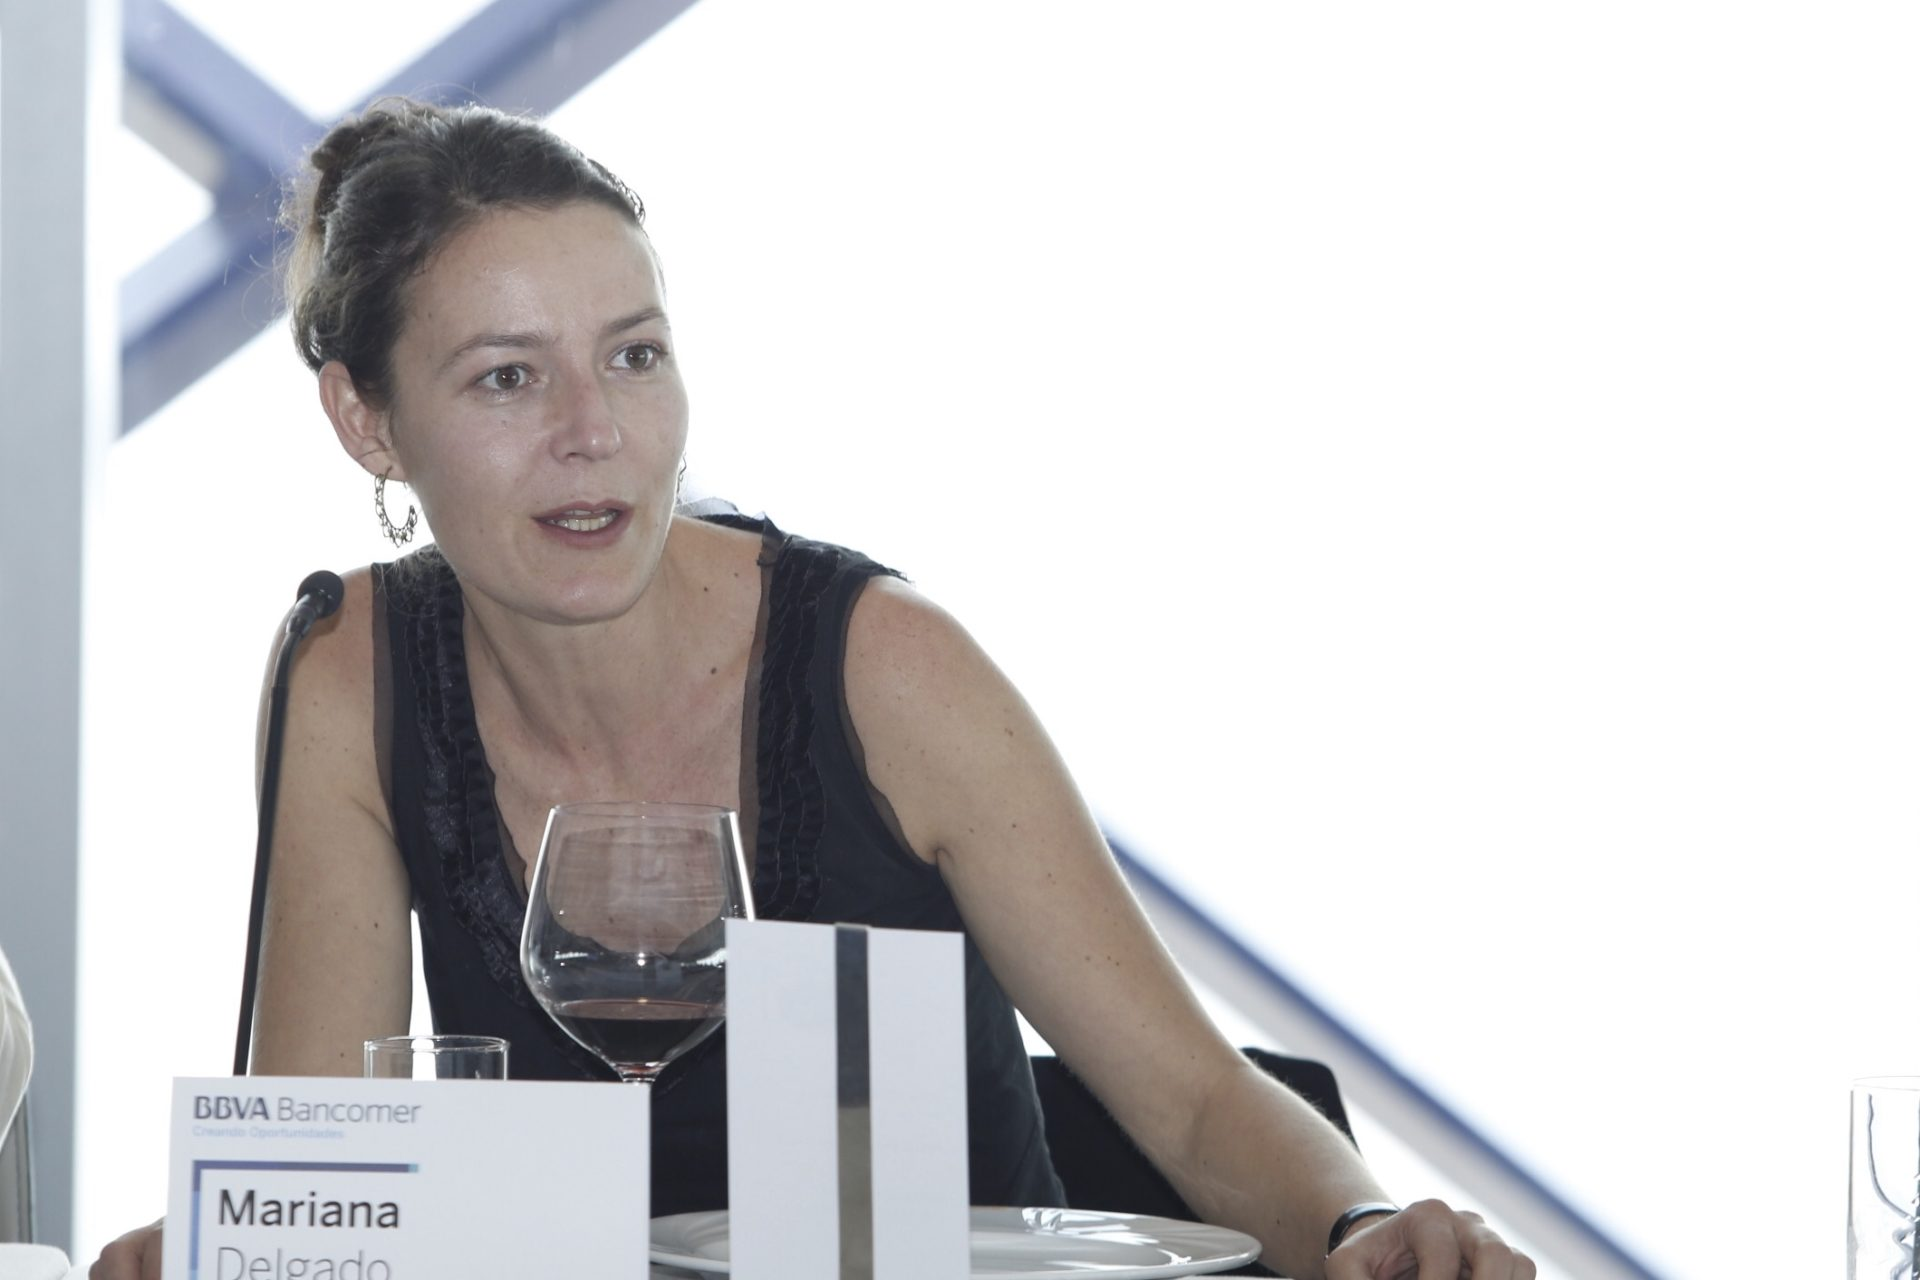 Mariana de CCD Fundacion Bancomer